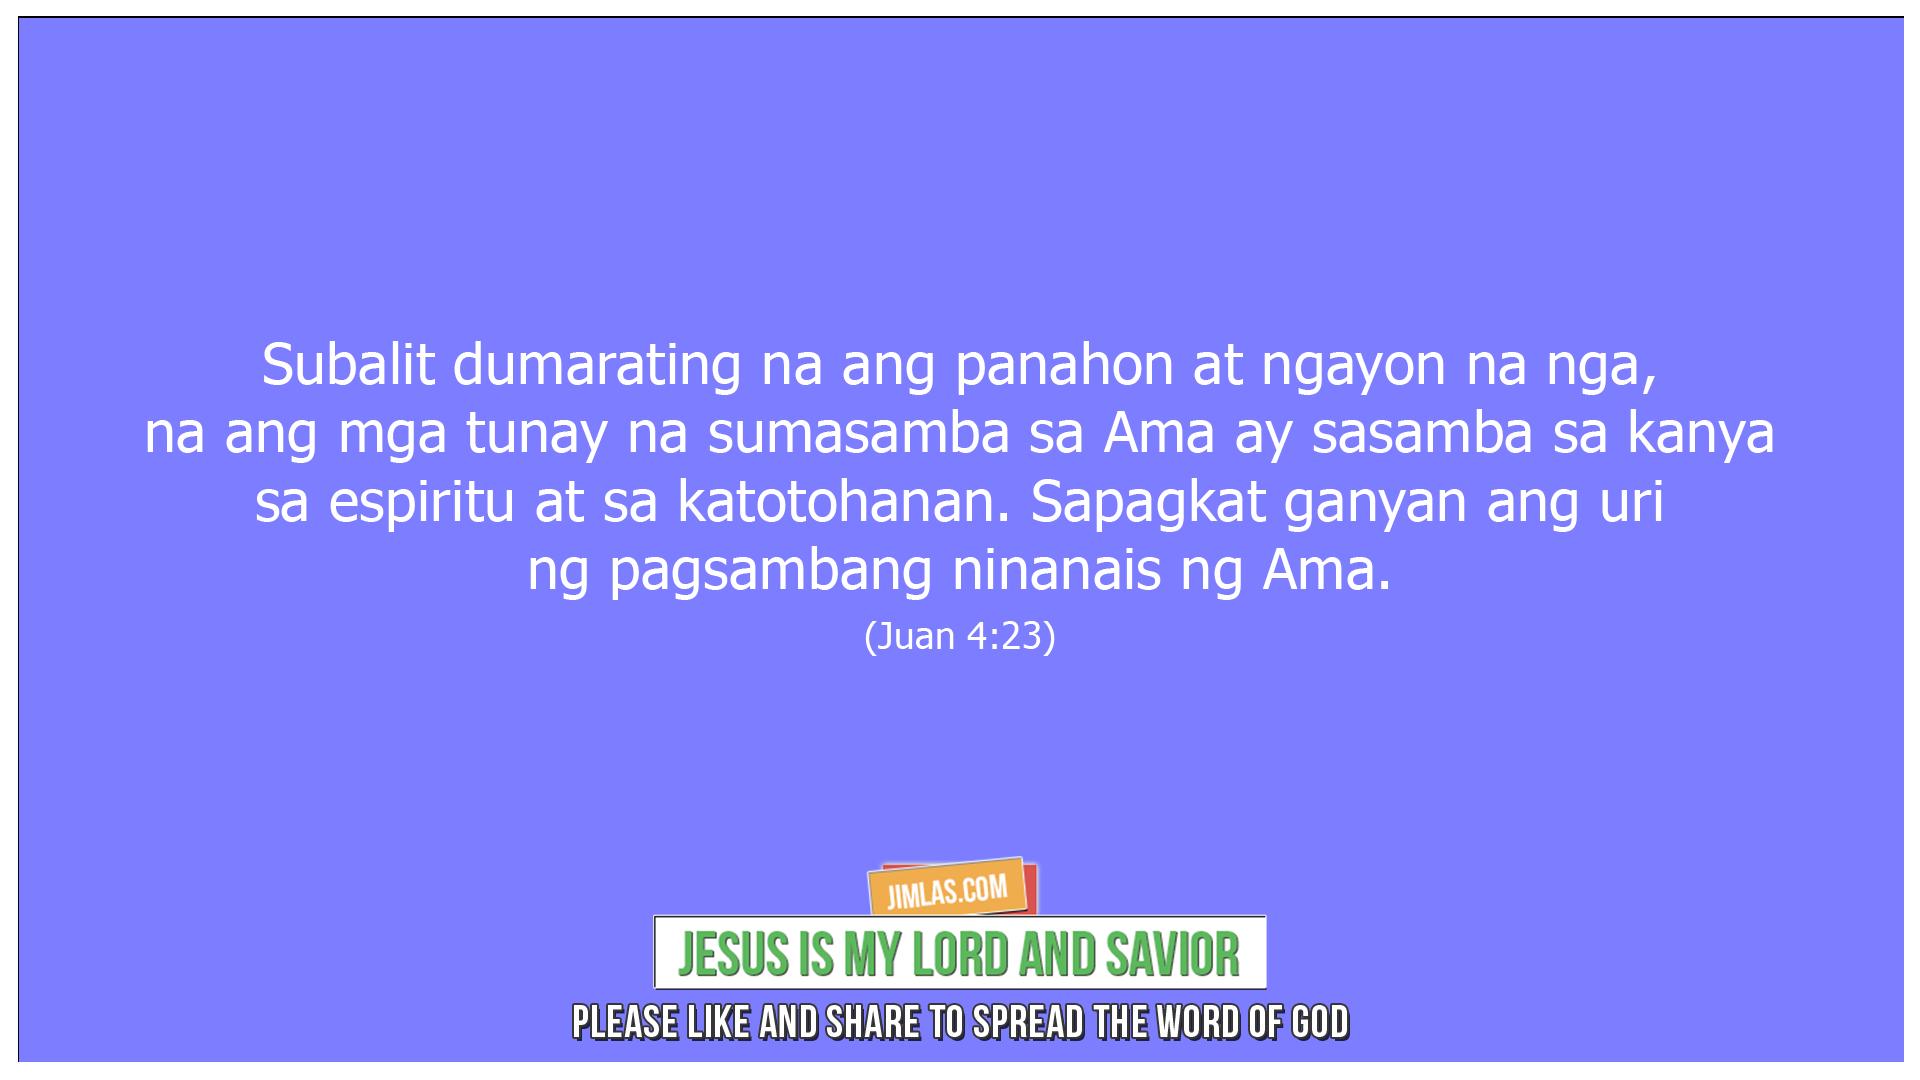 Juan 4 23, Juan 4:23